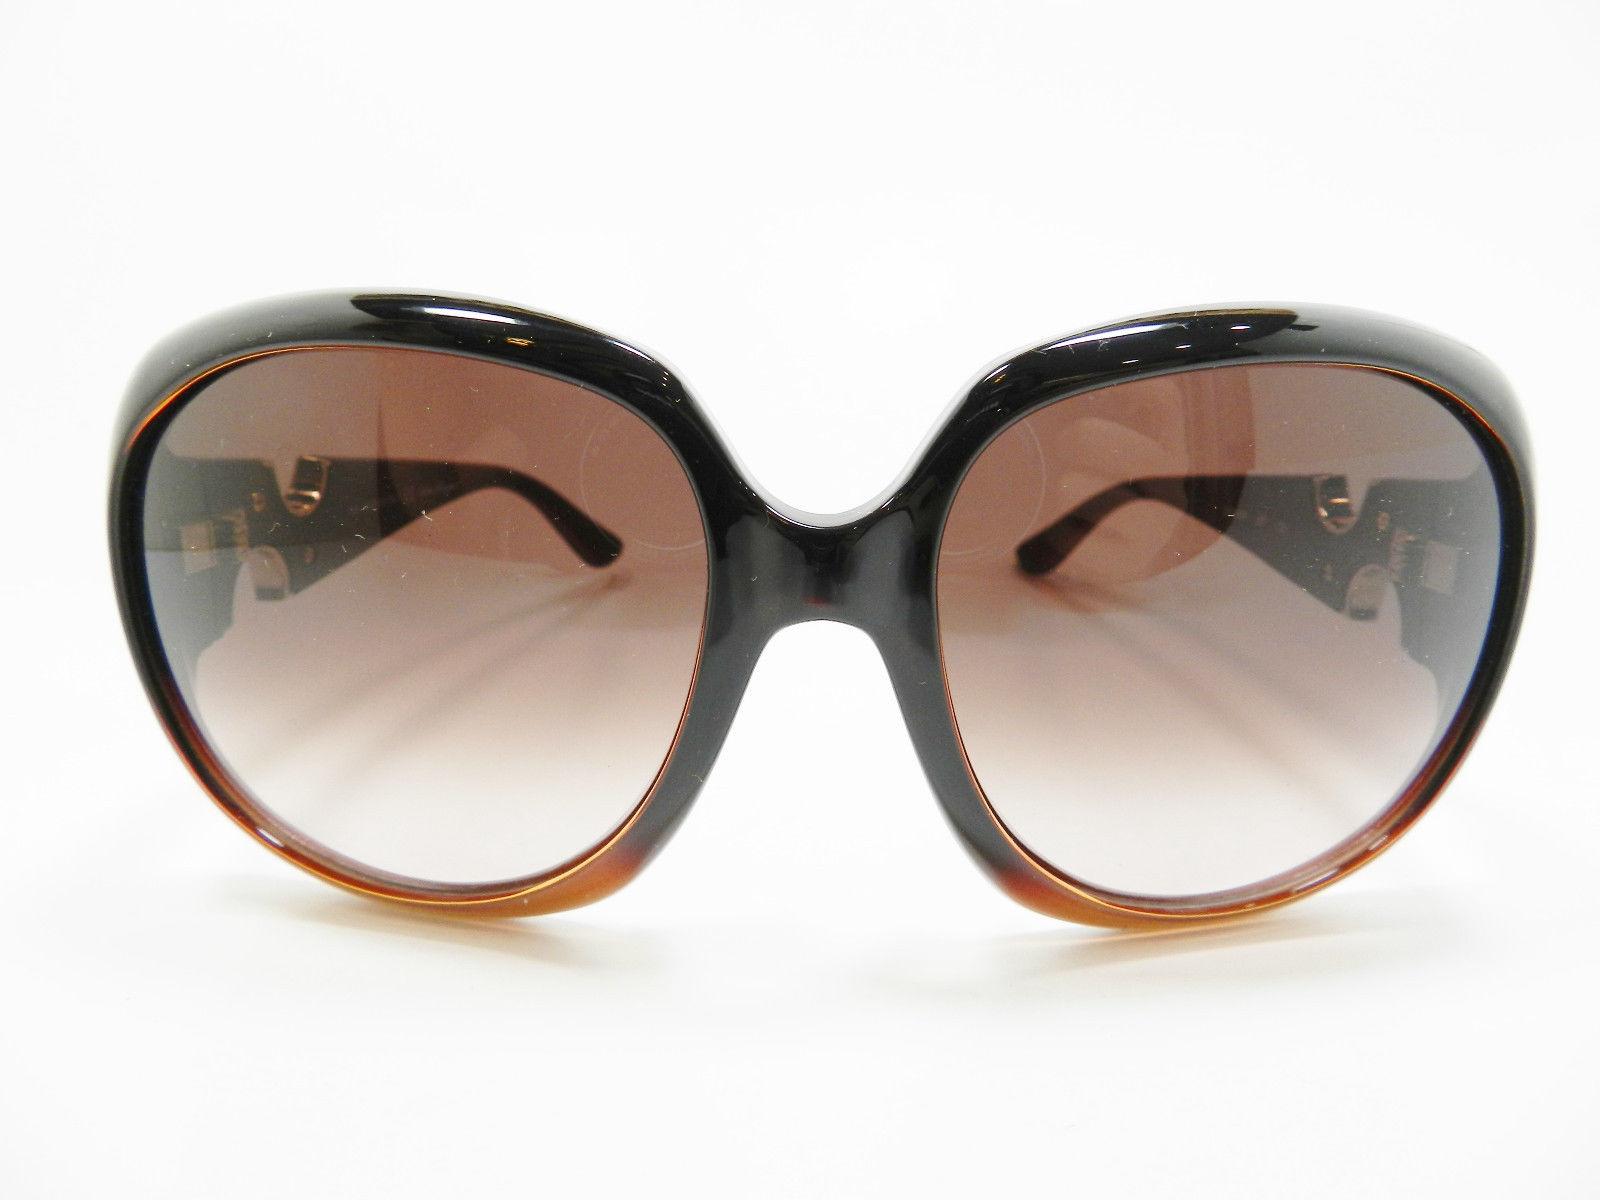 Ferragamo 641sr sunglasses for Decor my eyes